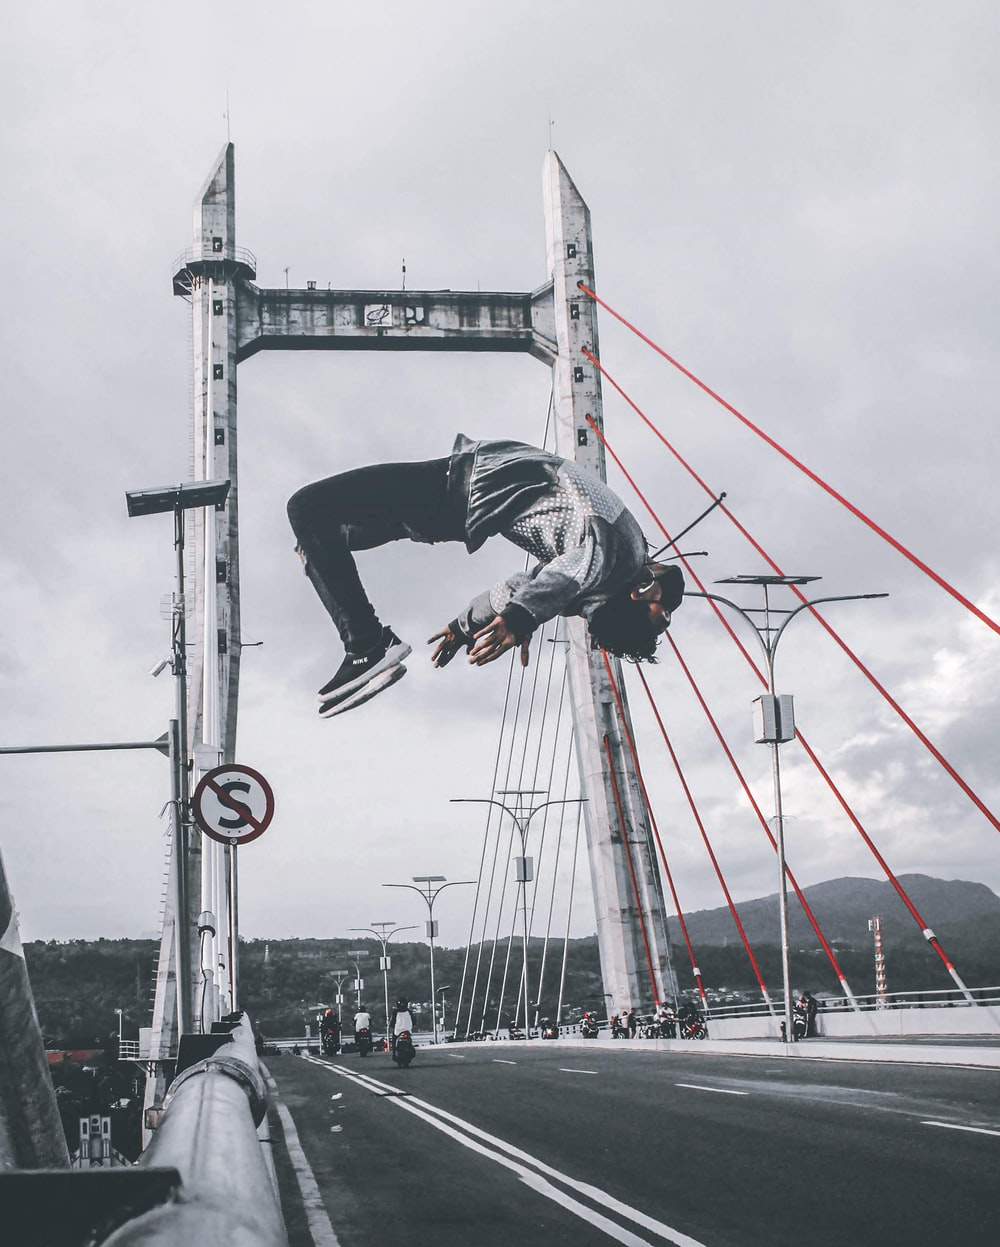 man in jacket and pants on concrete bridge